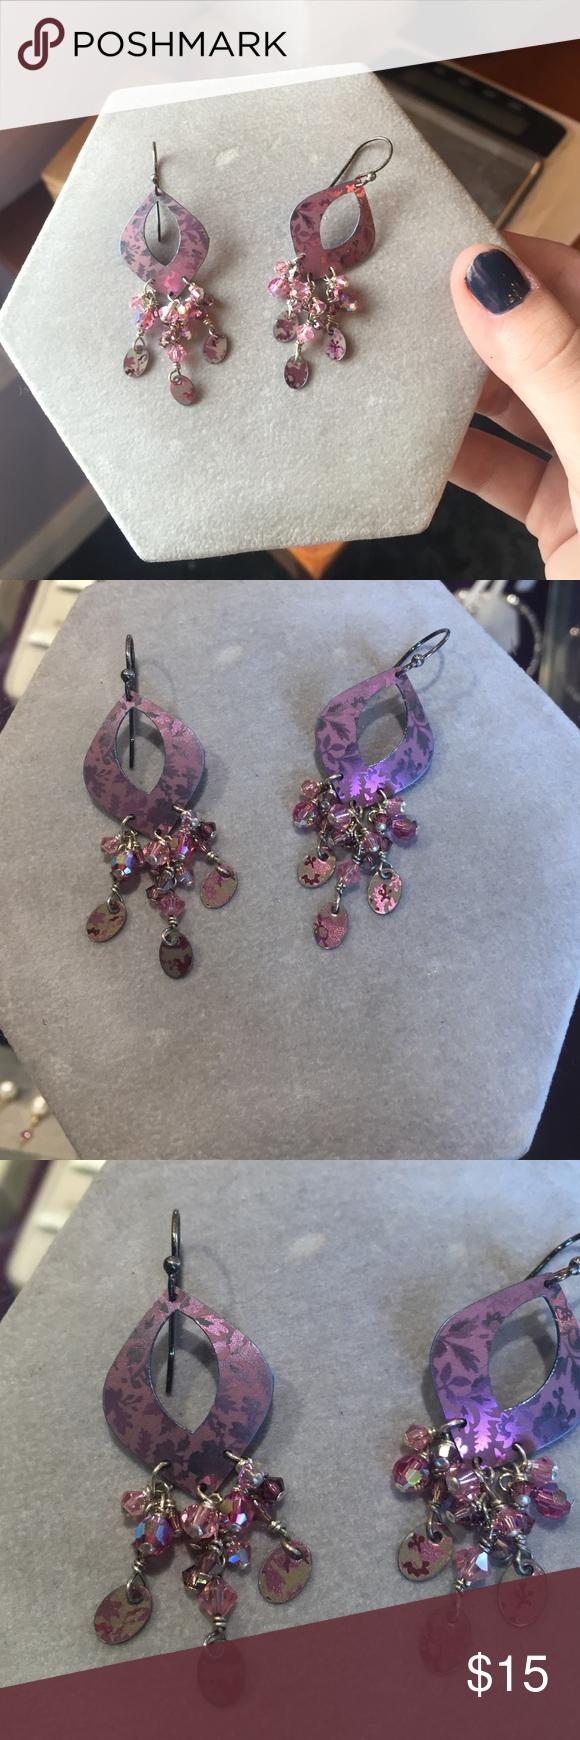 Sterling silver pink earrings Beautiful pink earrings made of metal with Sterling silver findings. The pink metal have metallic designs on them Jewelry Earrings